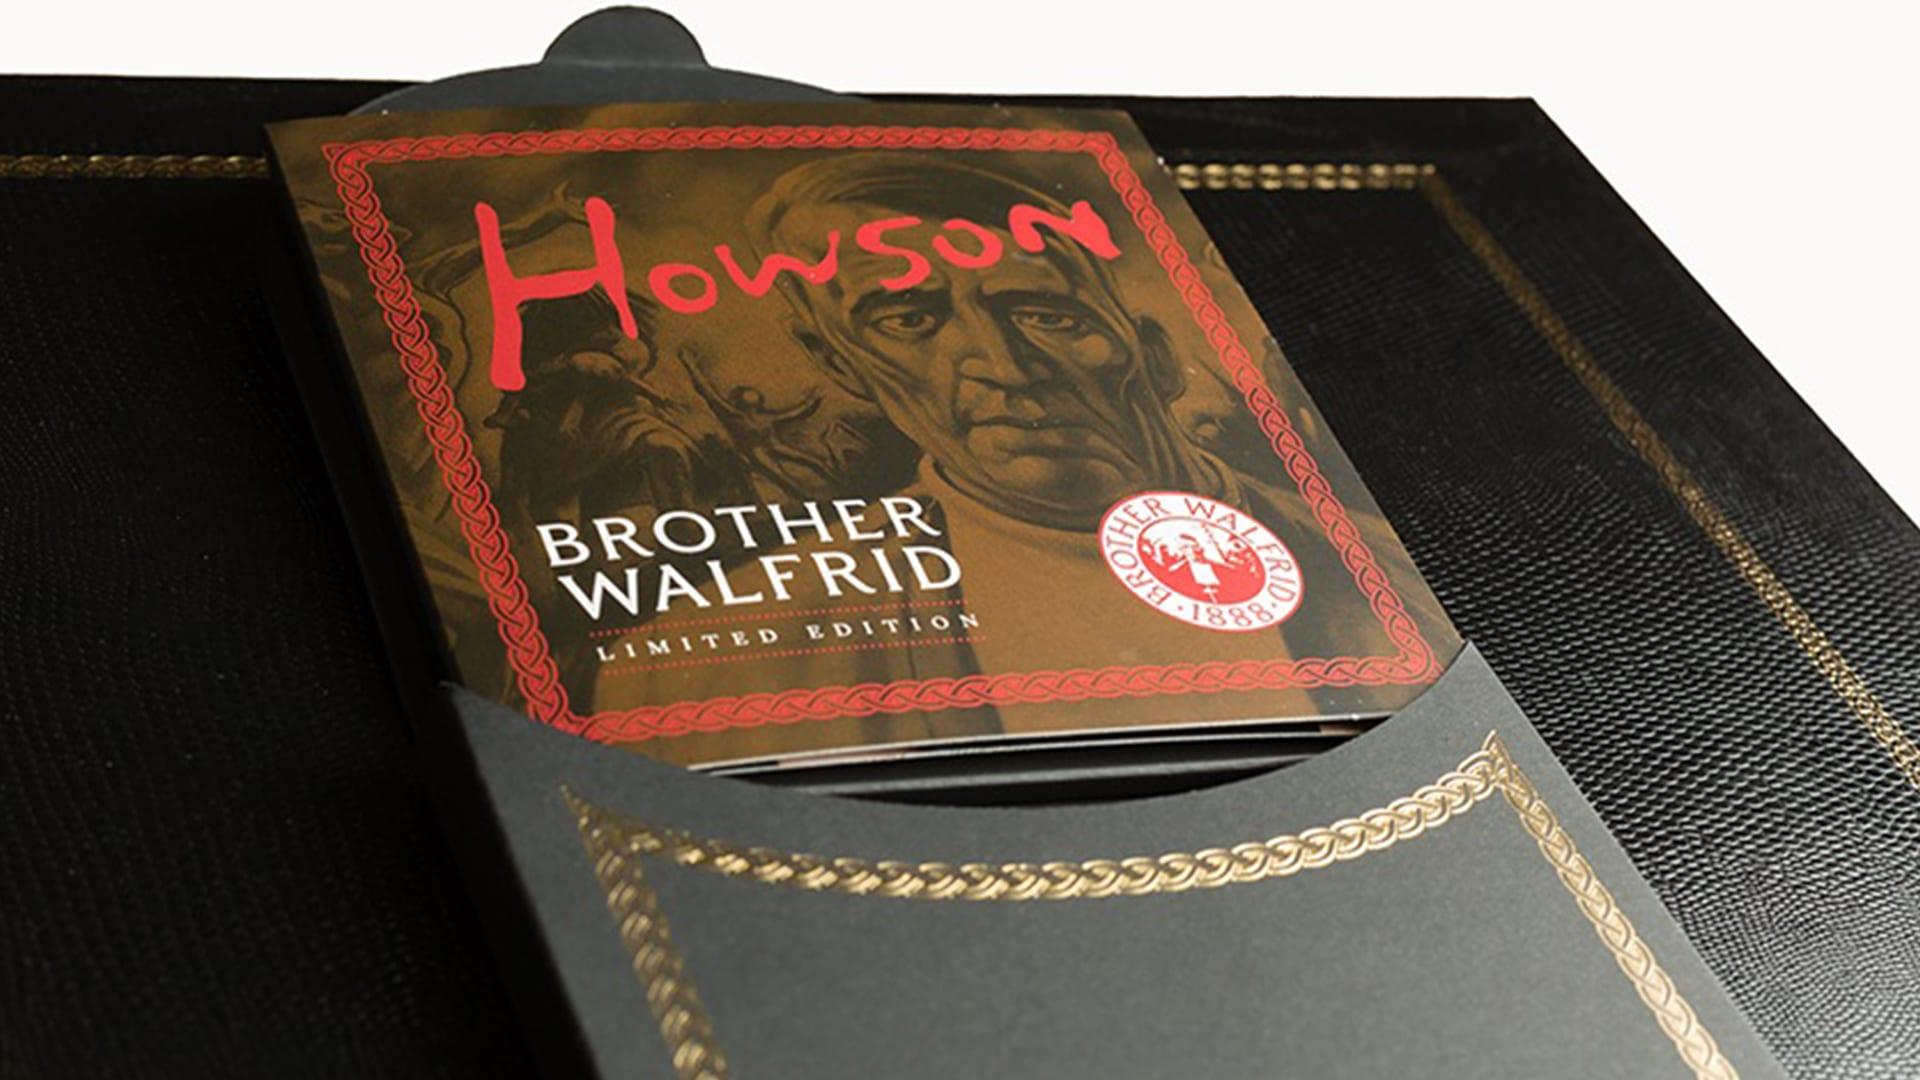 Brother Walfrid Art Box Packaging Design